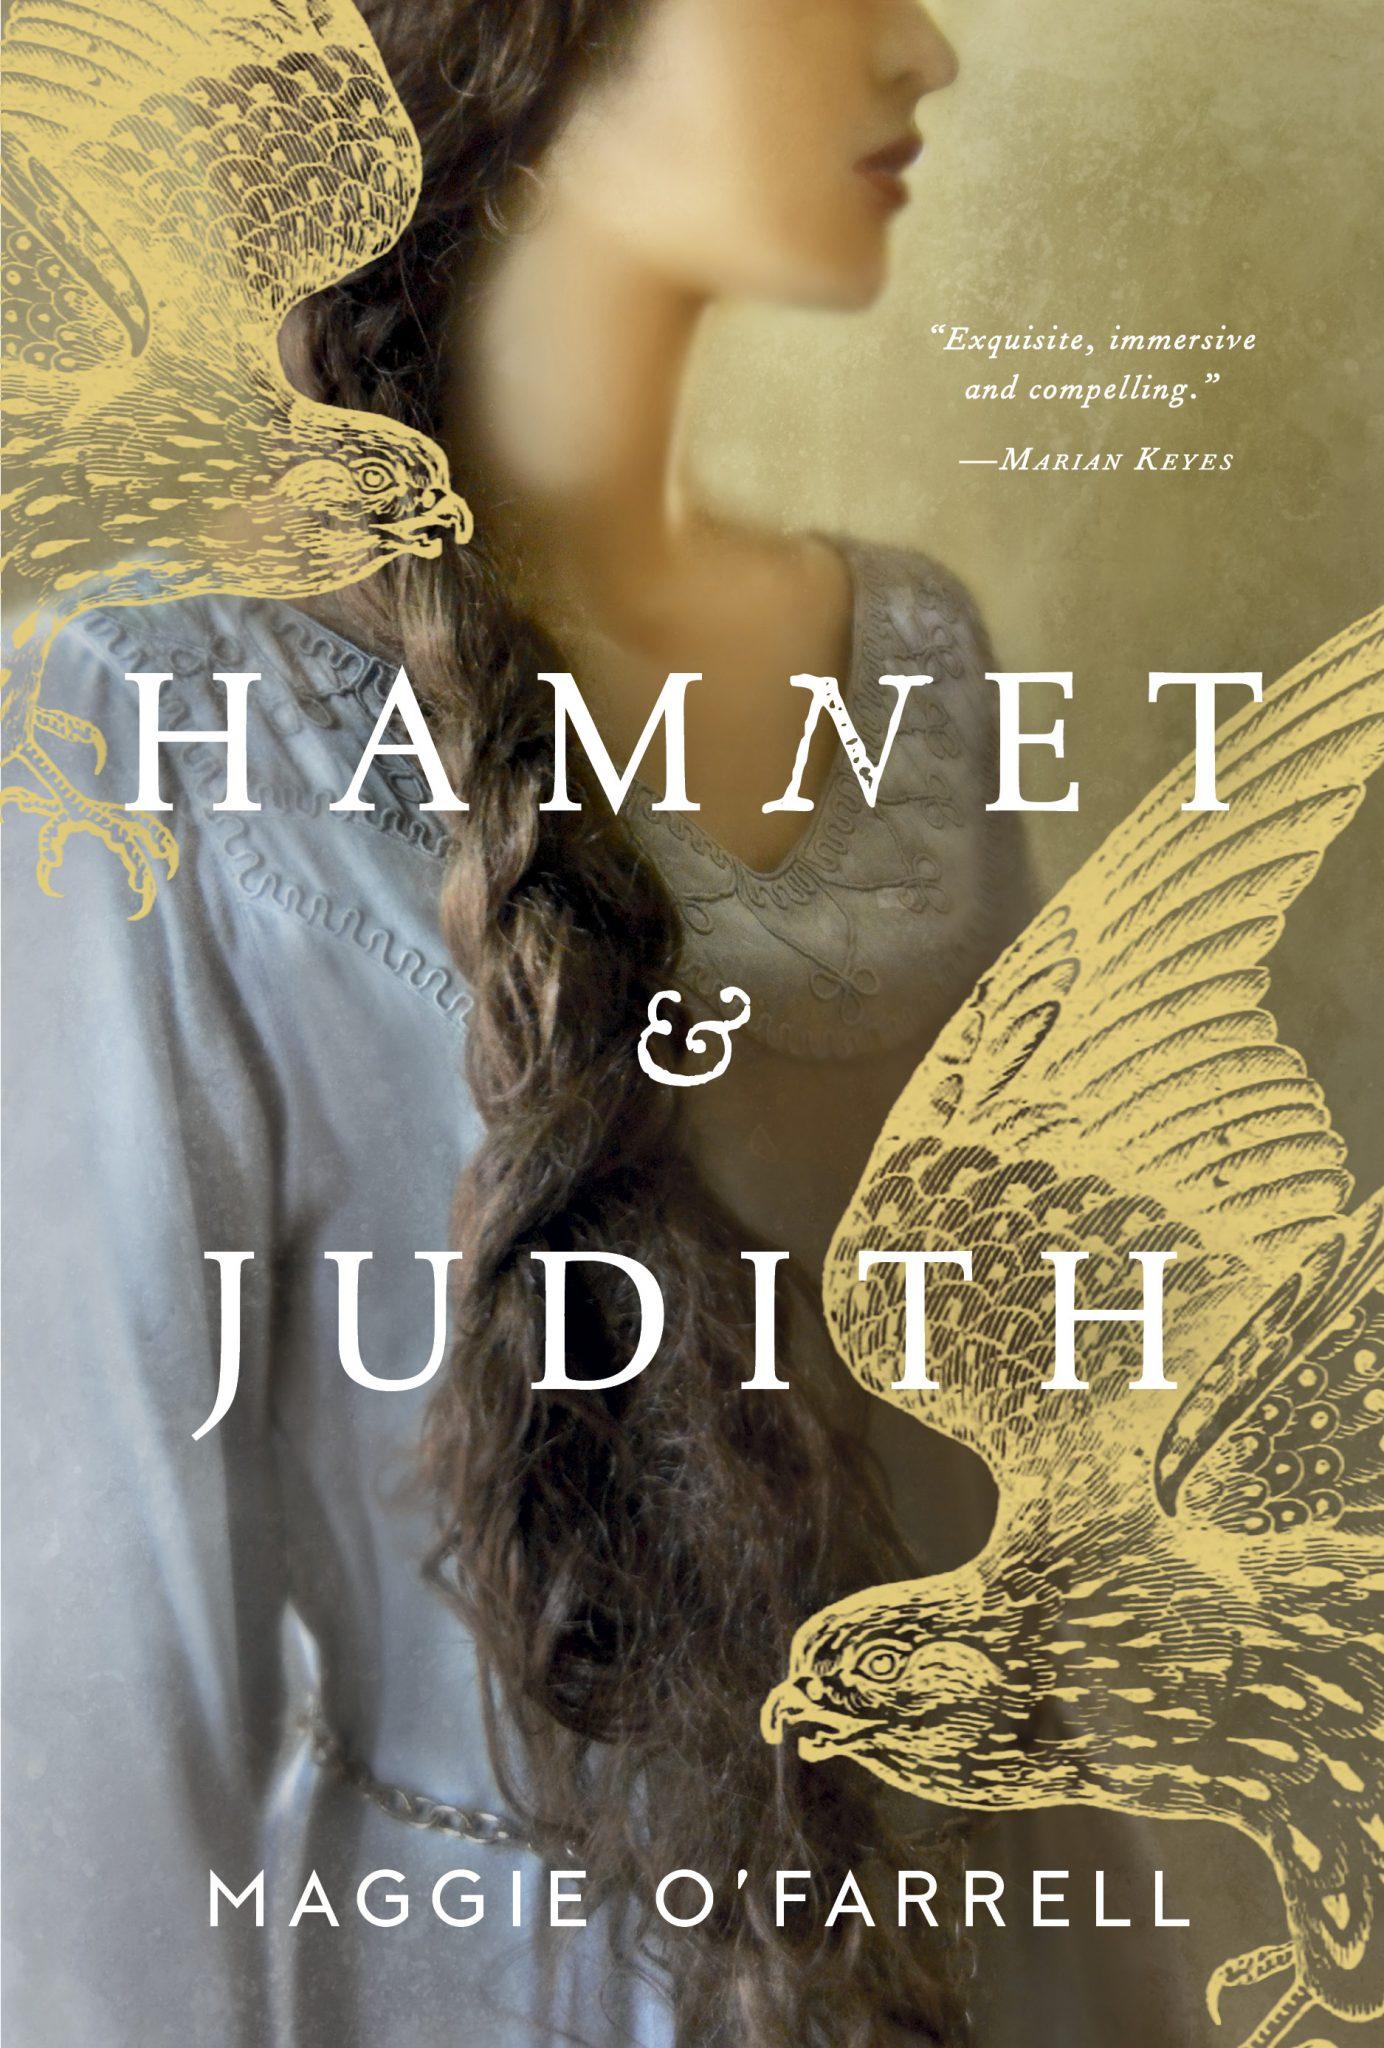 Hamnet & Judith by Maggie O'Farrell